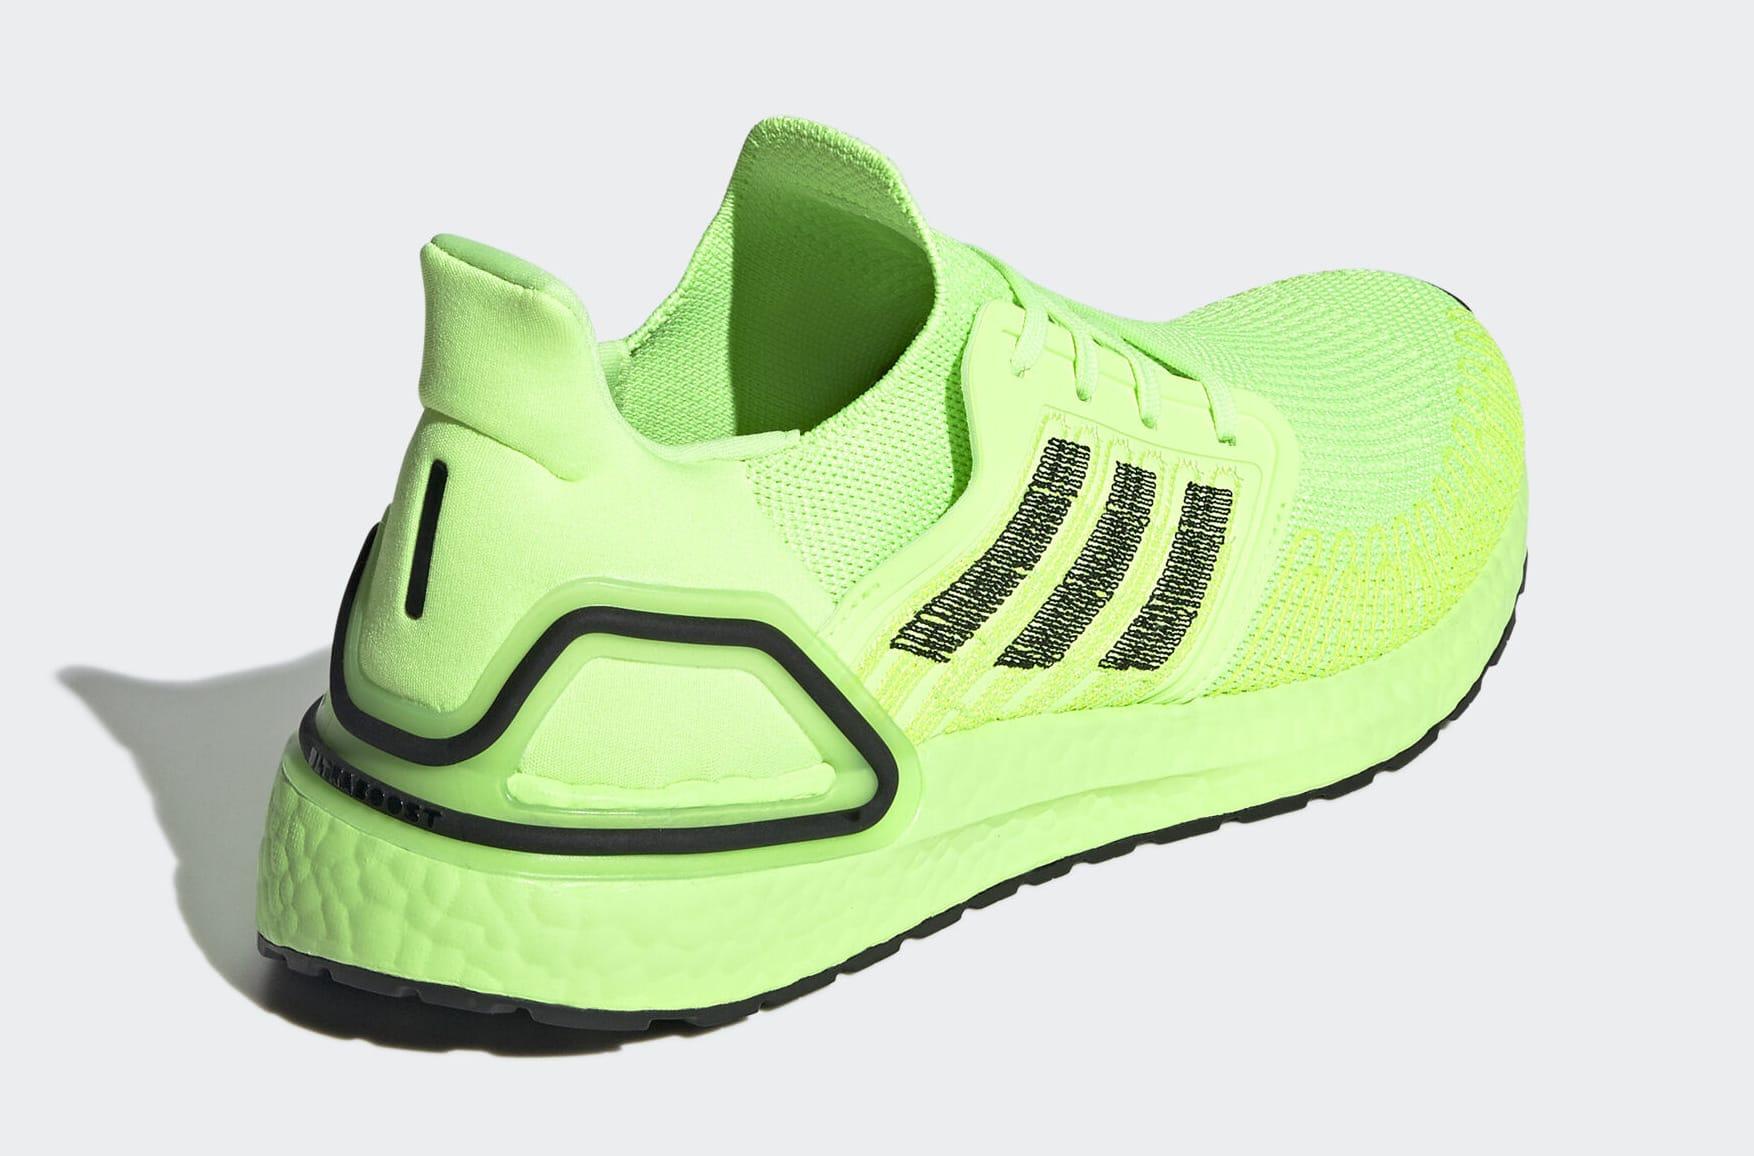 Ultra Boost 20,adidas,UB20  難得一見的綠色 Boost!Ultra Boost 20 全新配色即將發售